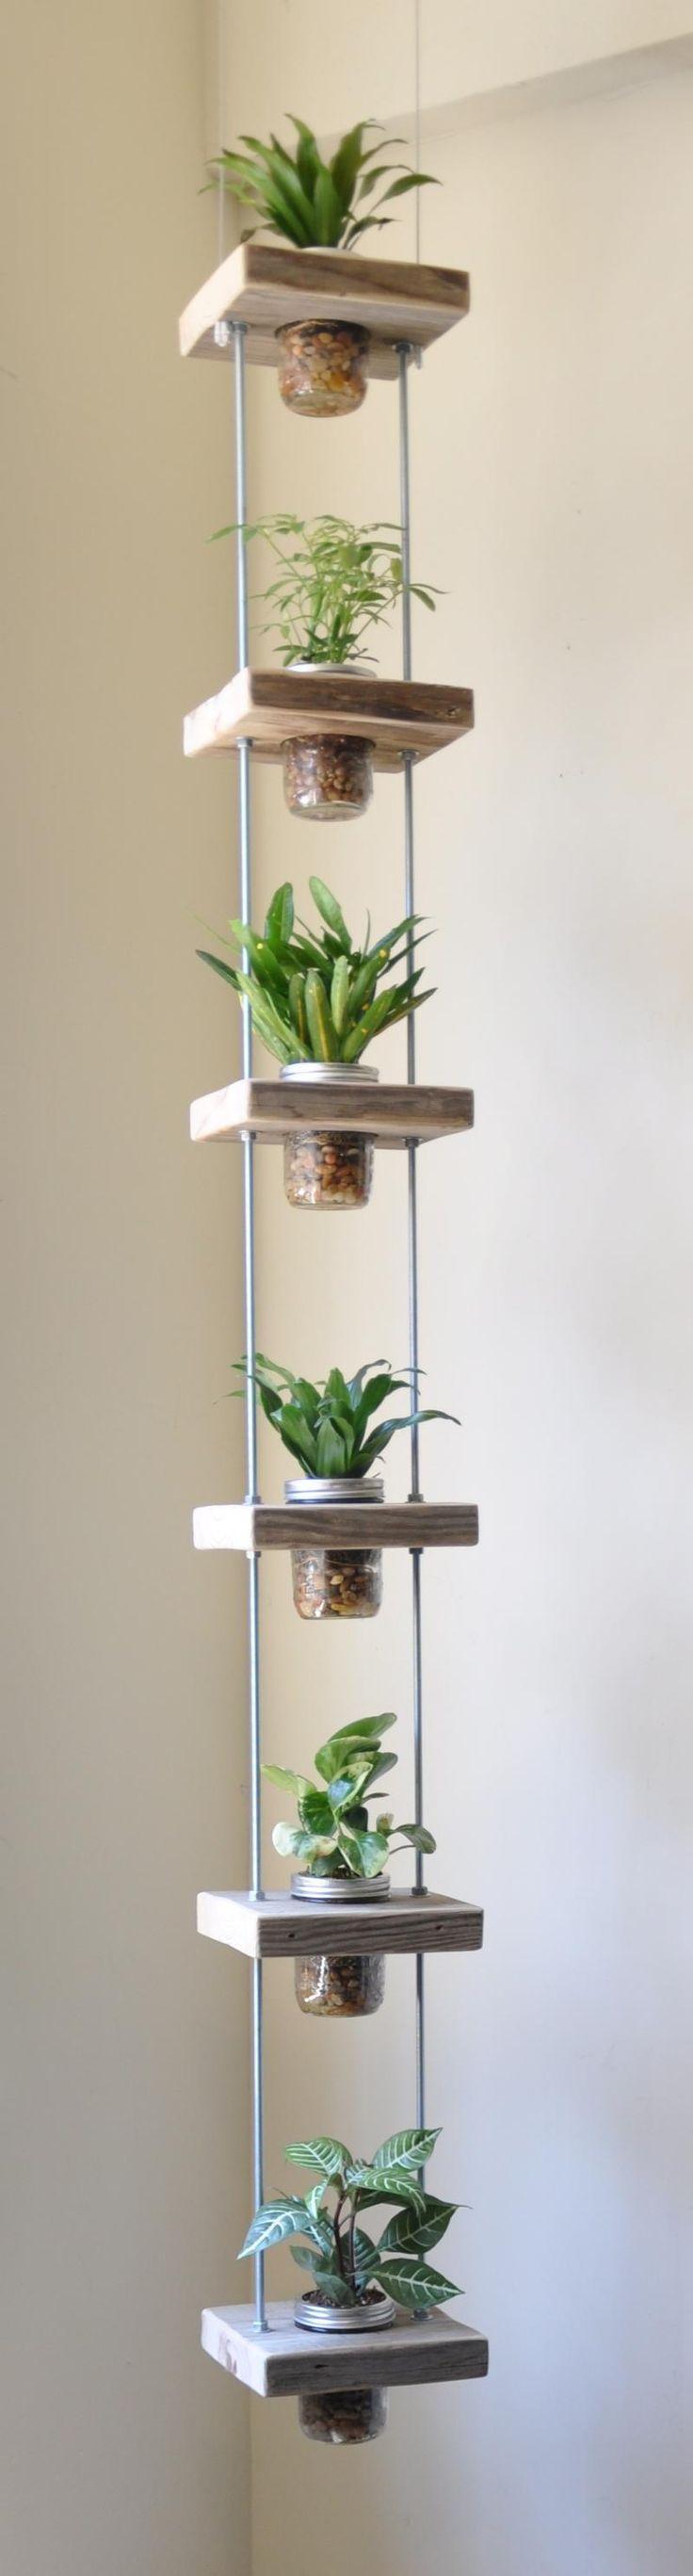 Hanging Herb Jar Garden.